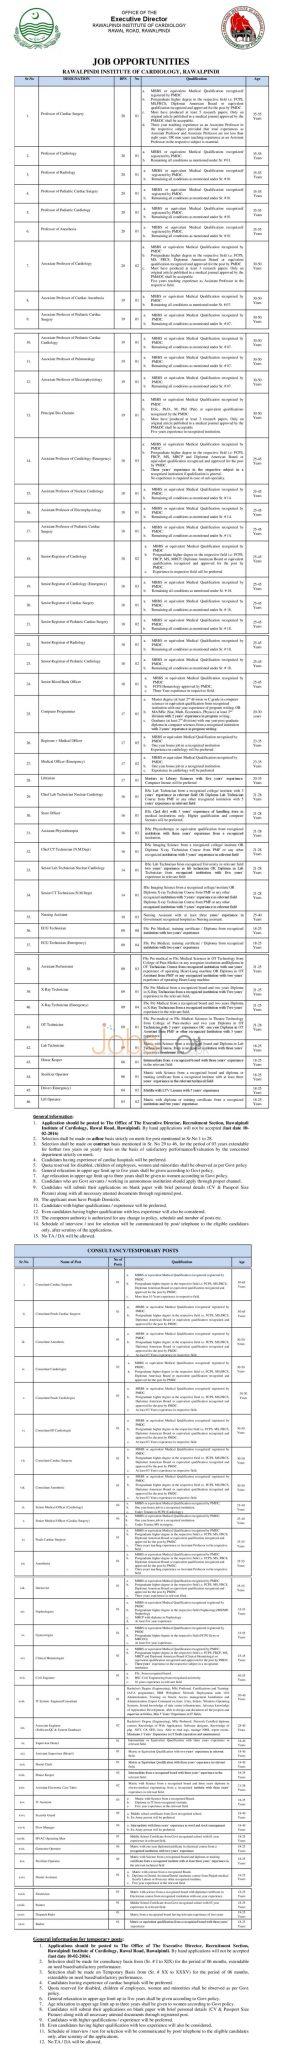 Rawalpindi Institute of Cardiology Jobs 26th January 2016